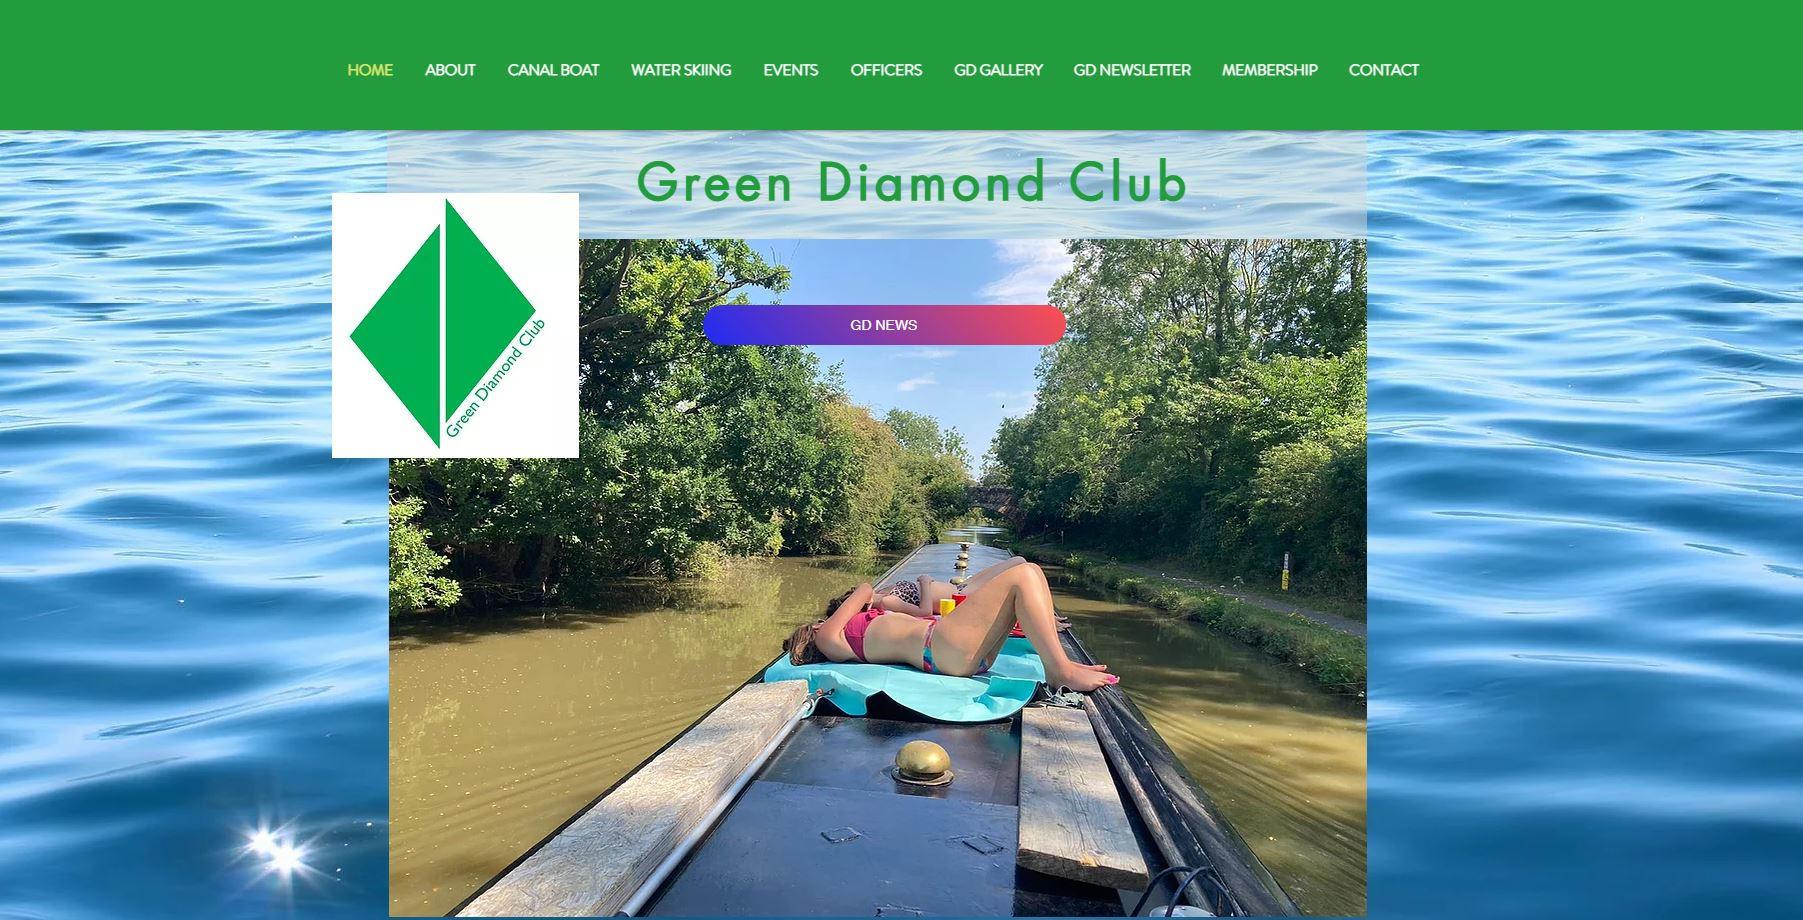 Green Diamond Club